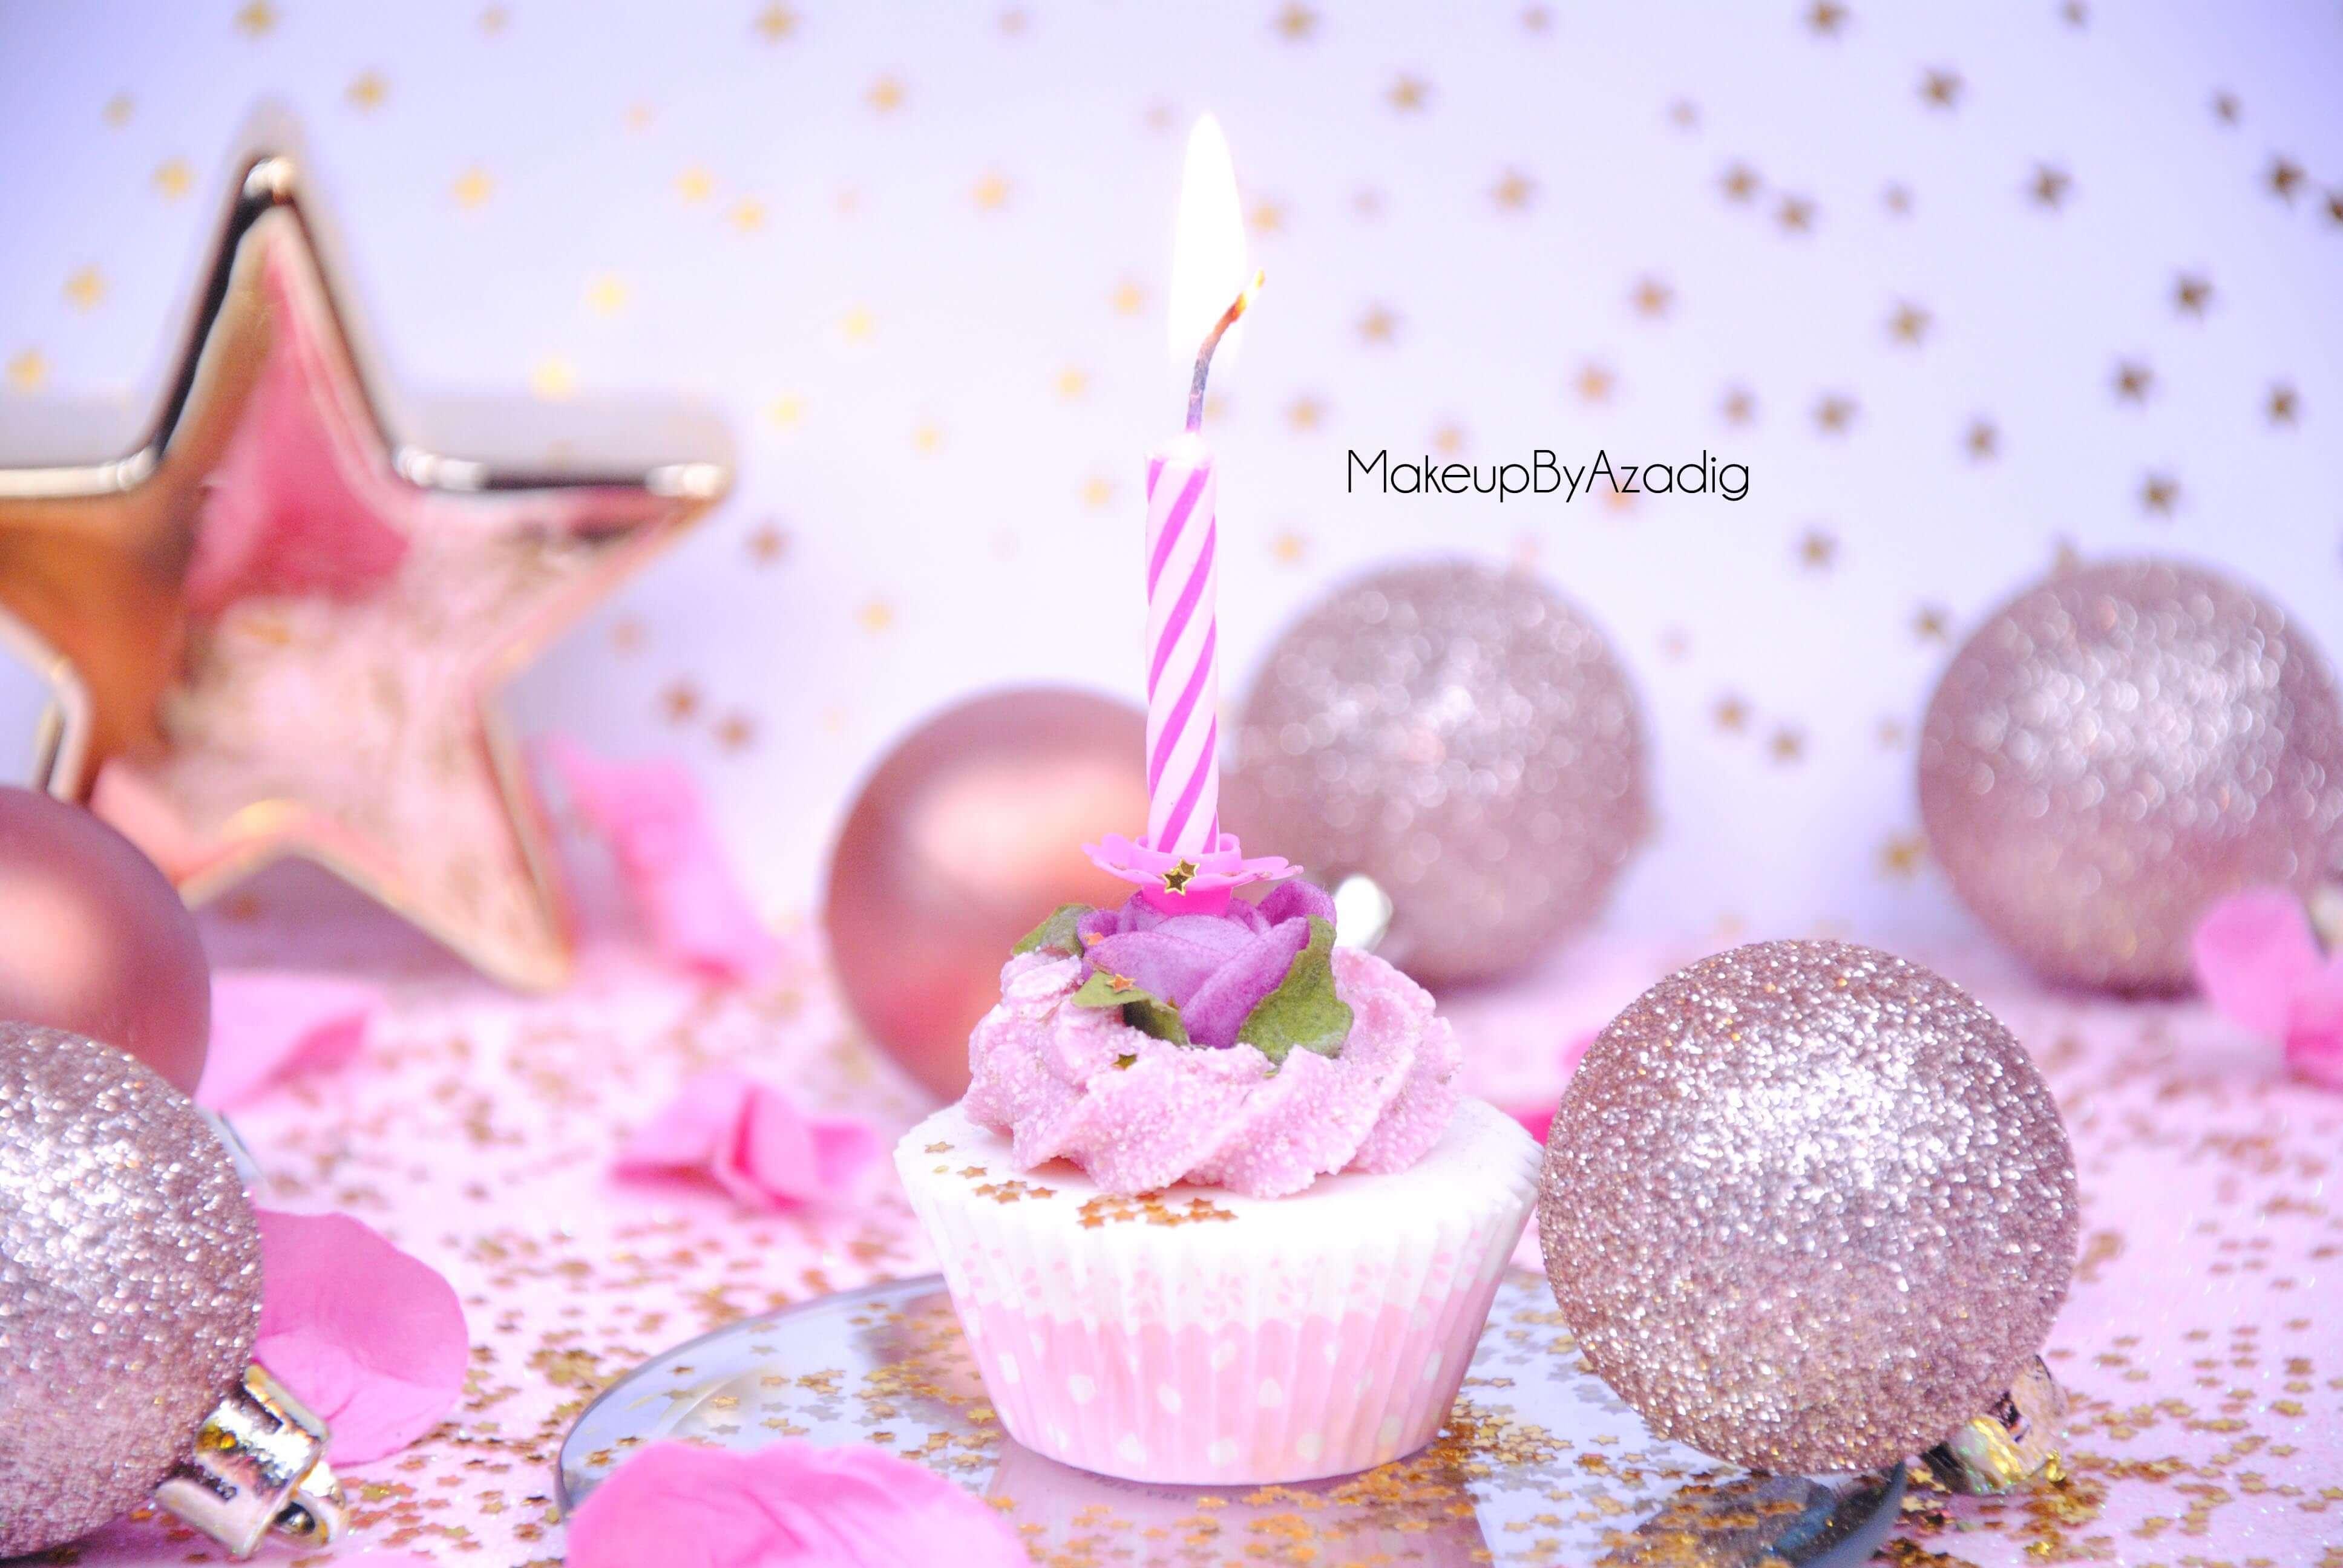 miniature-makeupbyazadig-joyeux-blog-anniversaire-influencer-troyes-paris-love